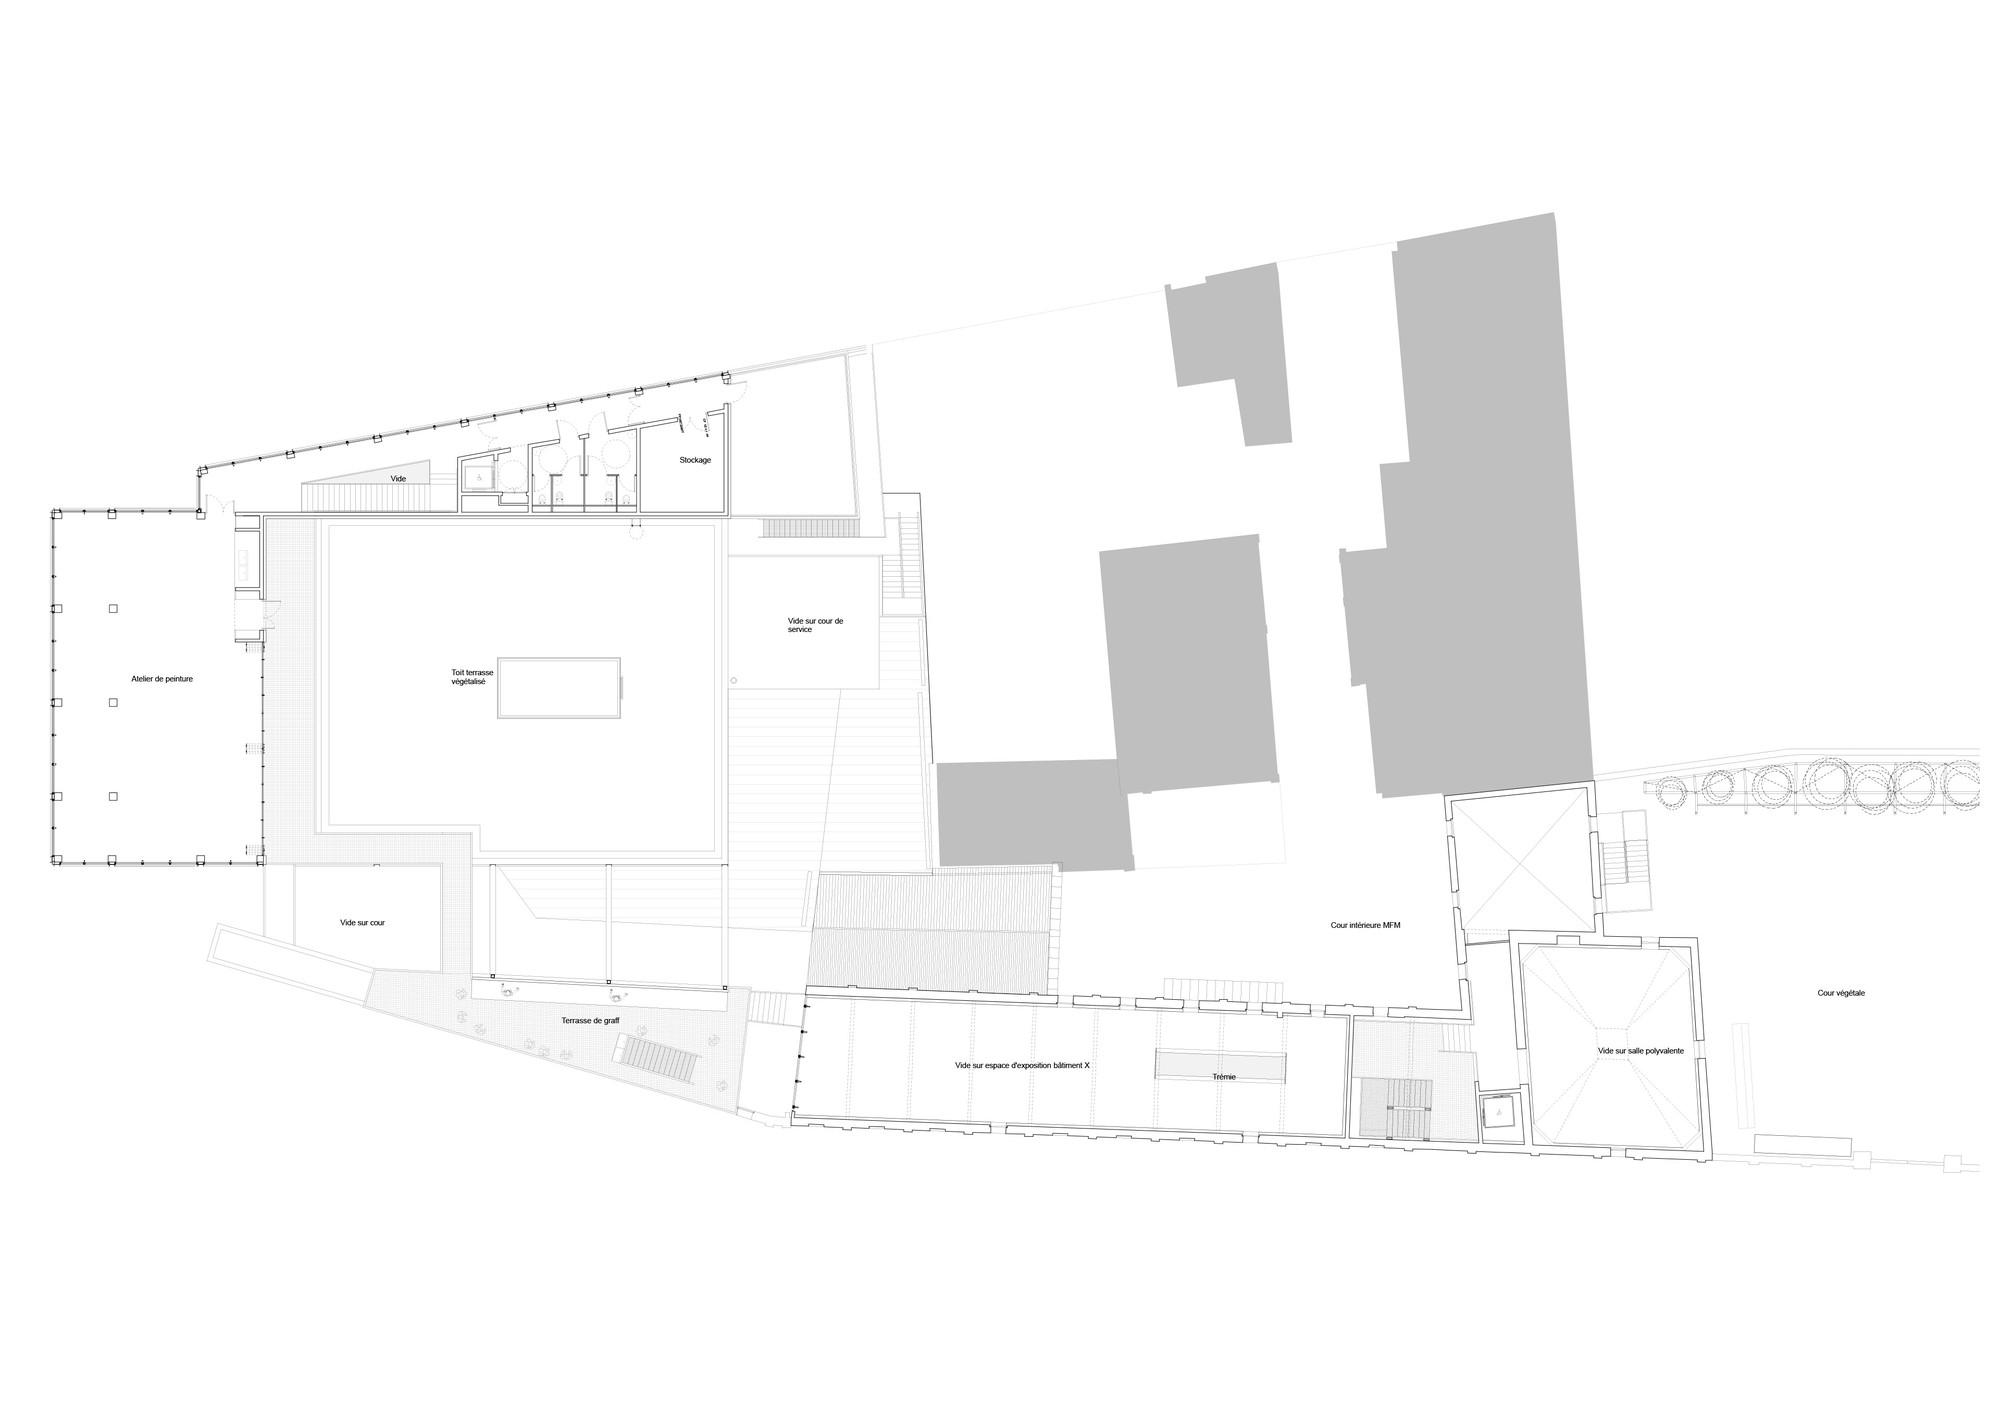 galer a de the flow atelier d architecture king kong 12. Black Bedroom Furniture Sets. Home Design Ideas